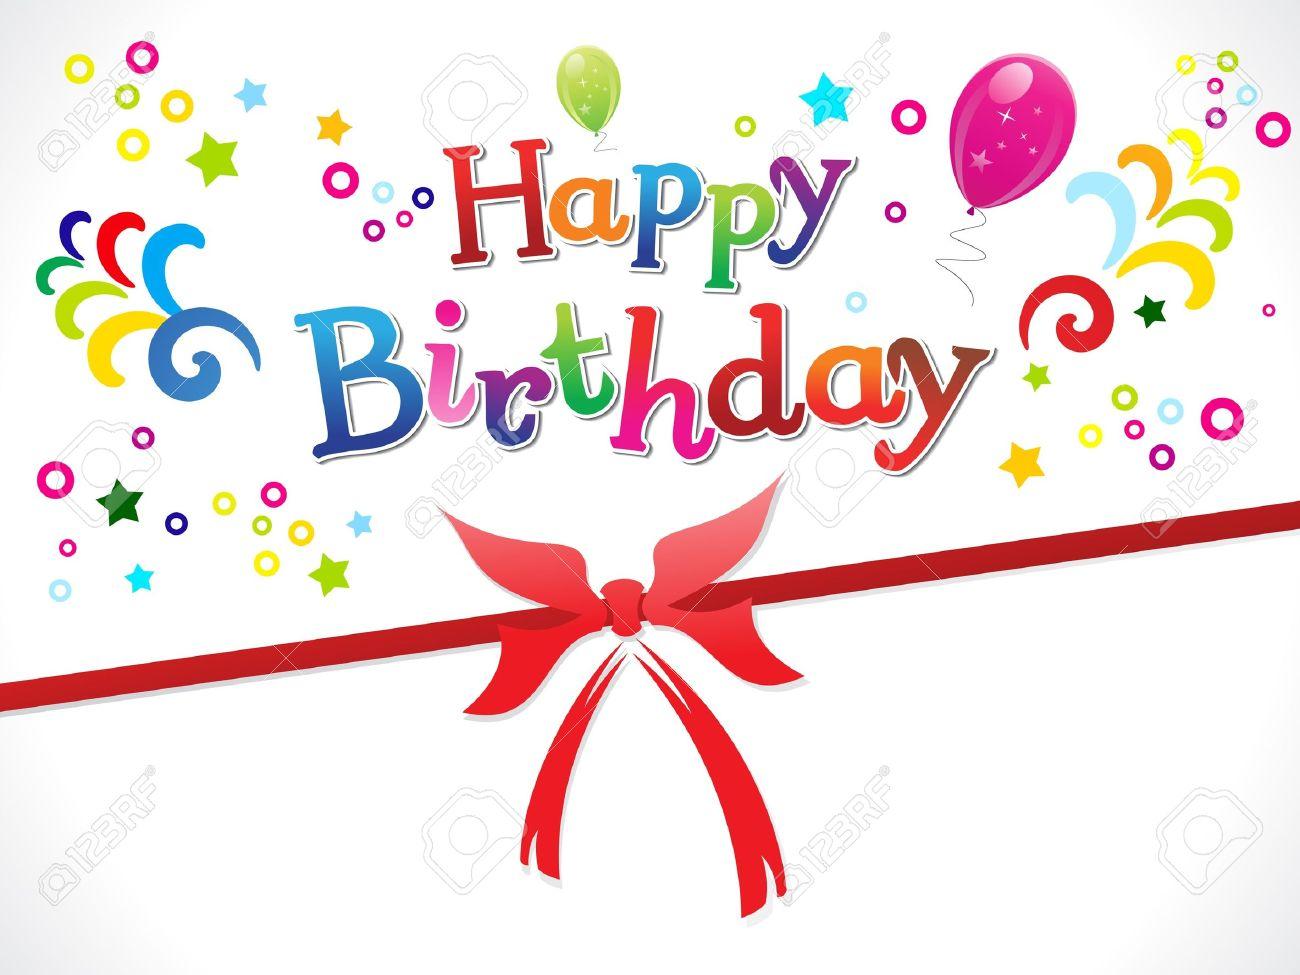 Birthday Card Templates Free – Free Online Birthday Card Templates